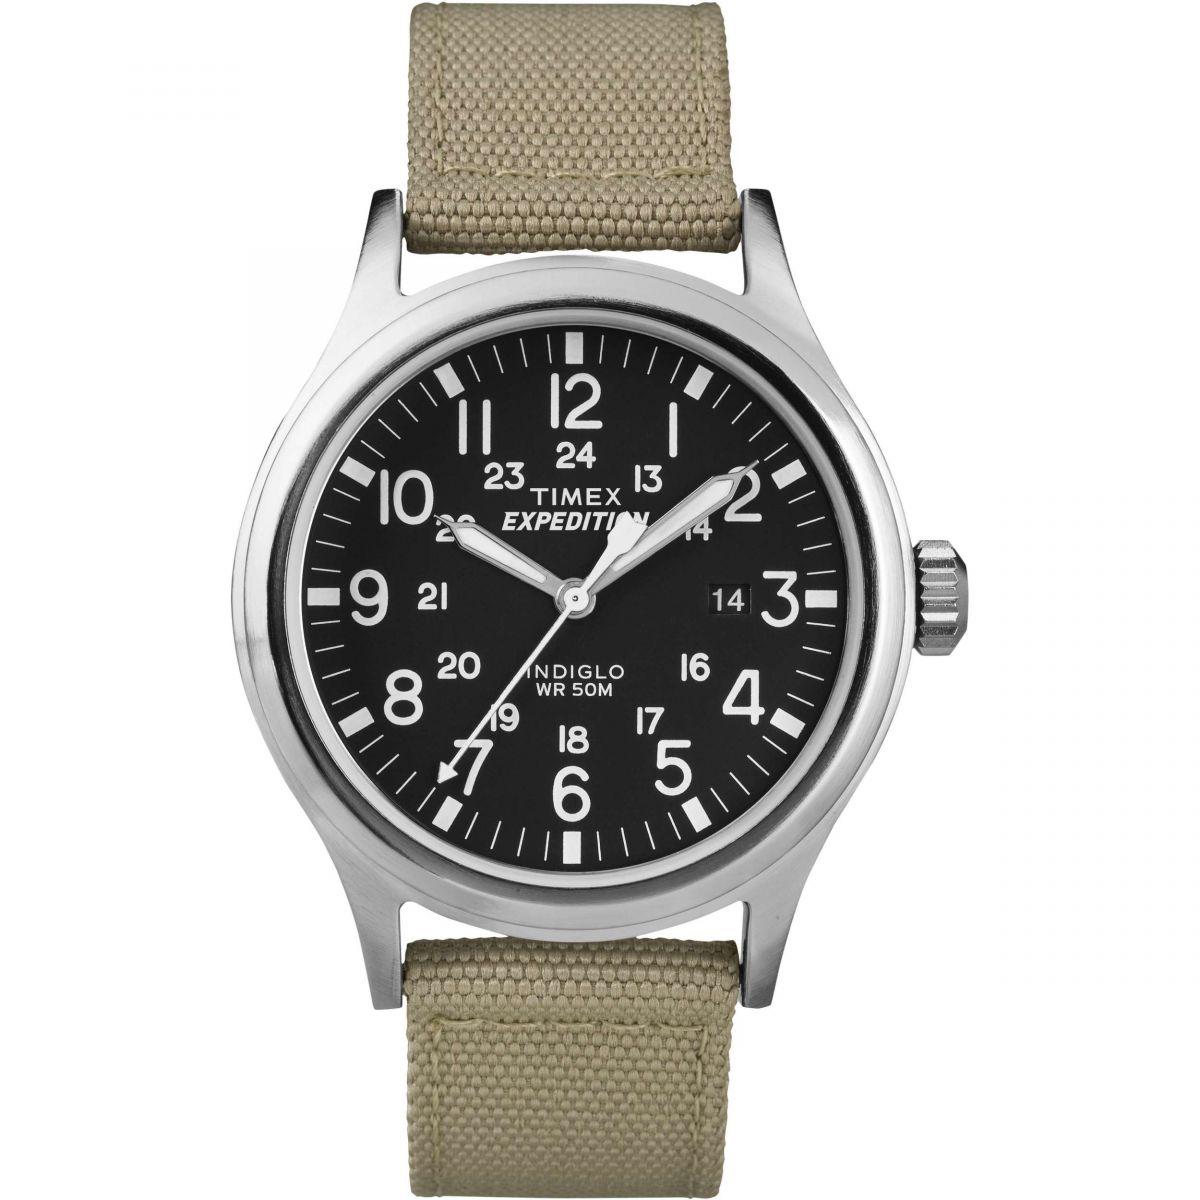 timex indiglo digital watch instructions